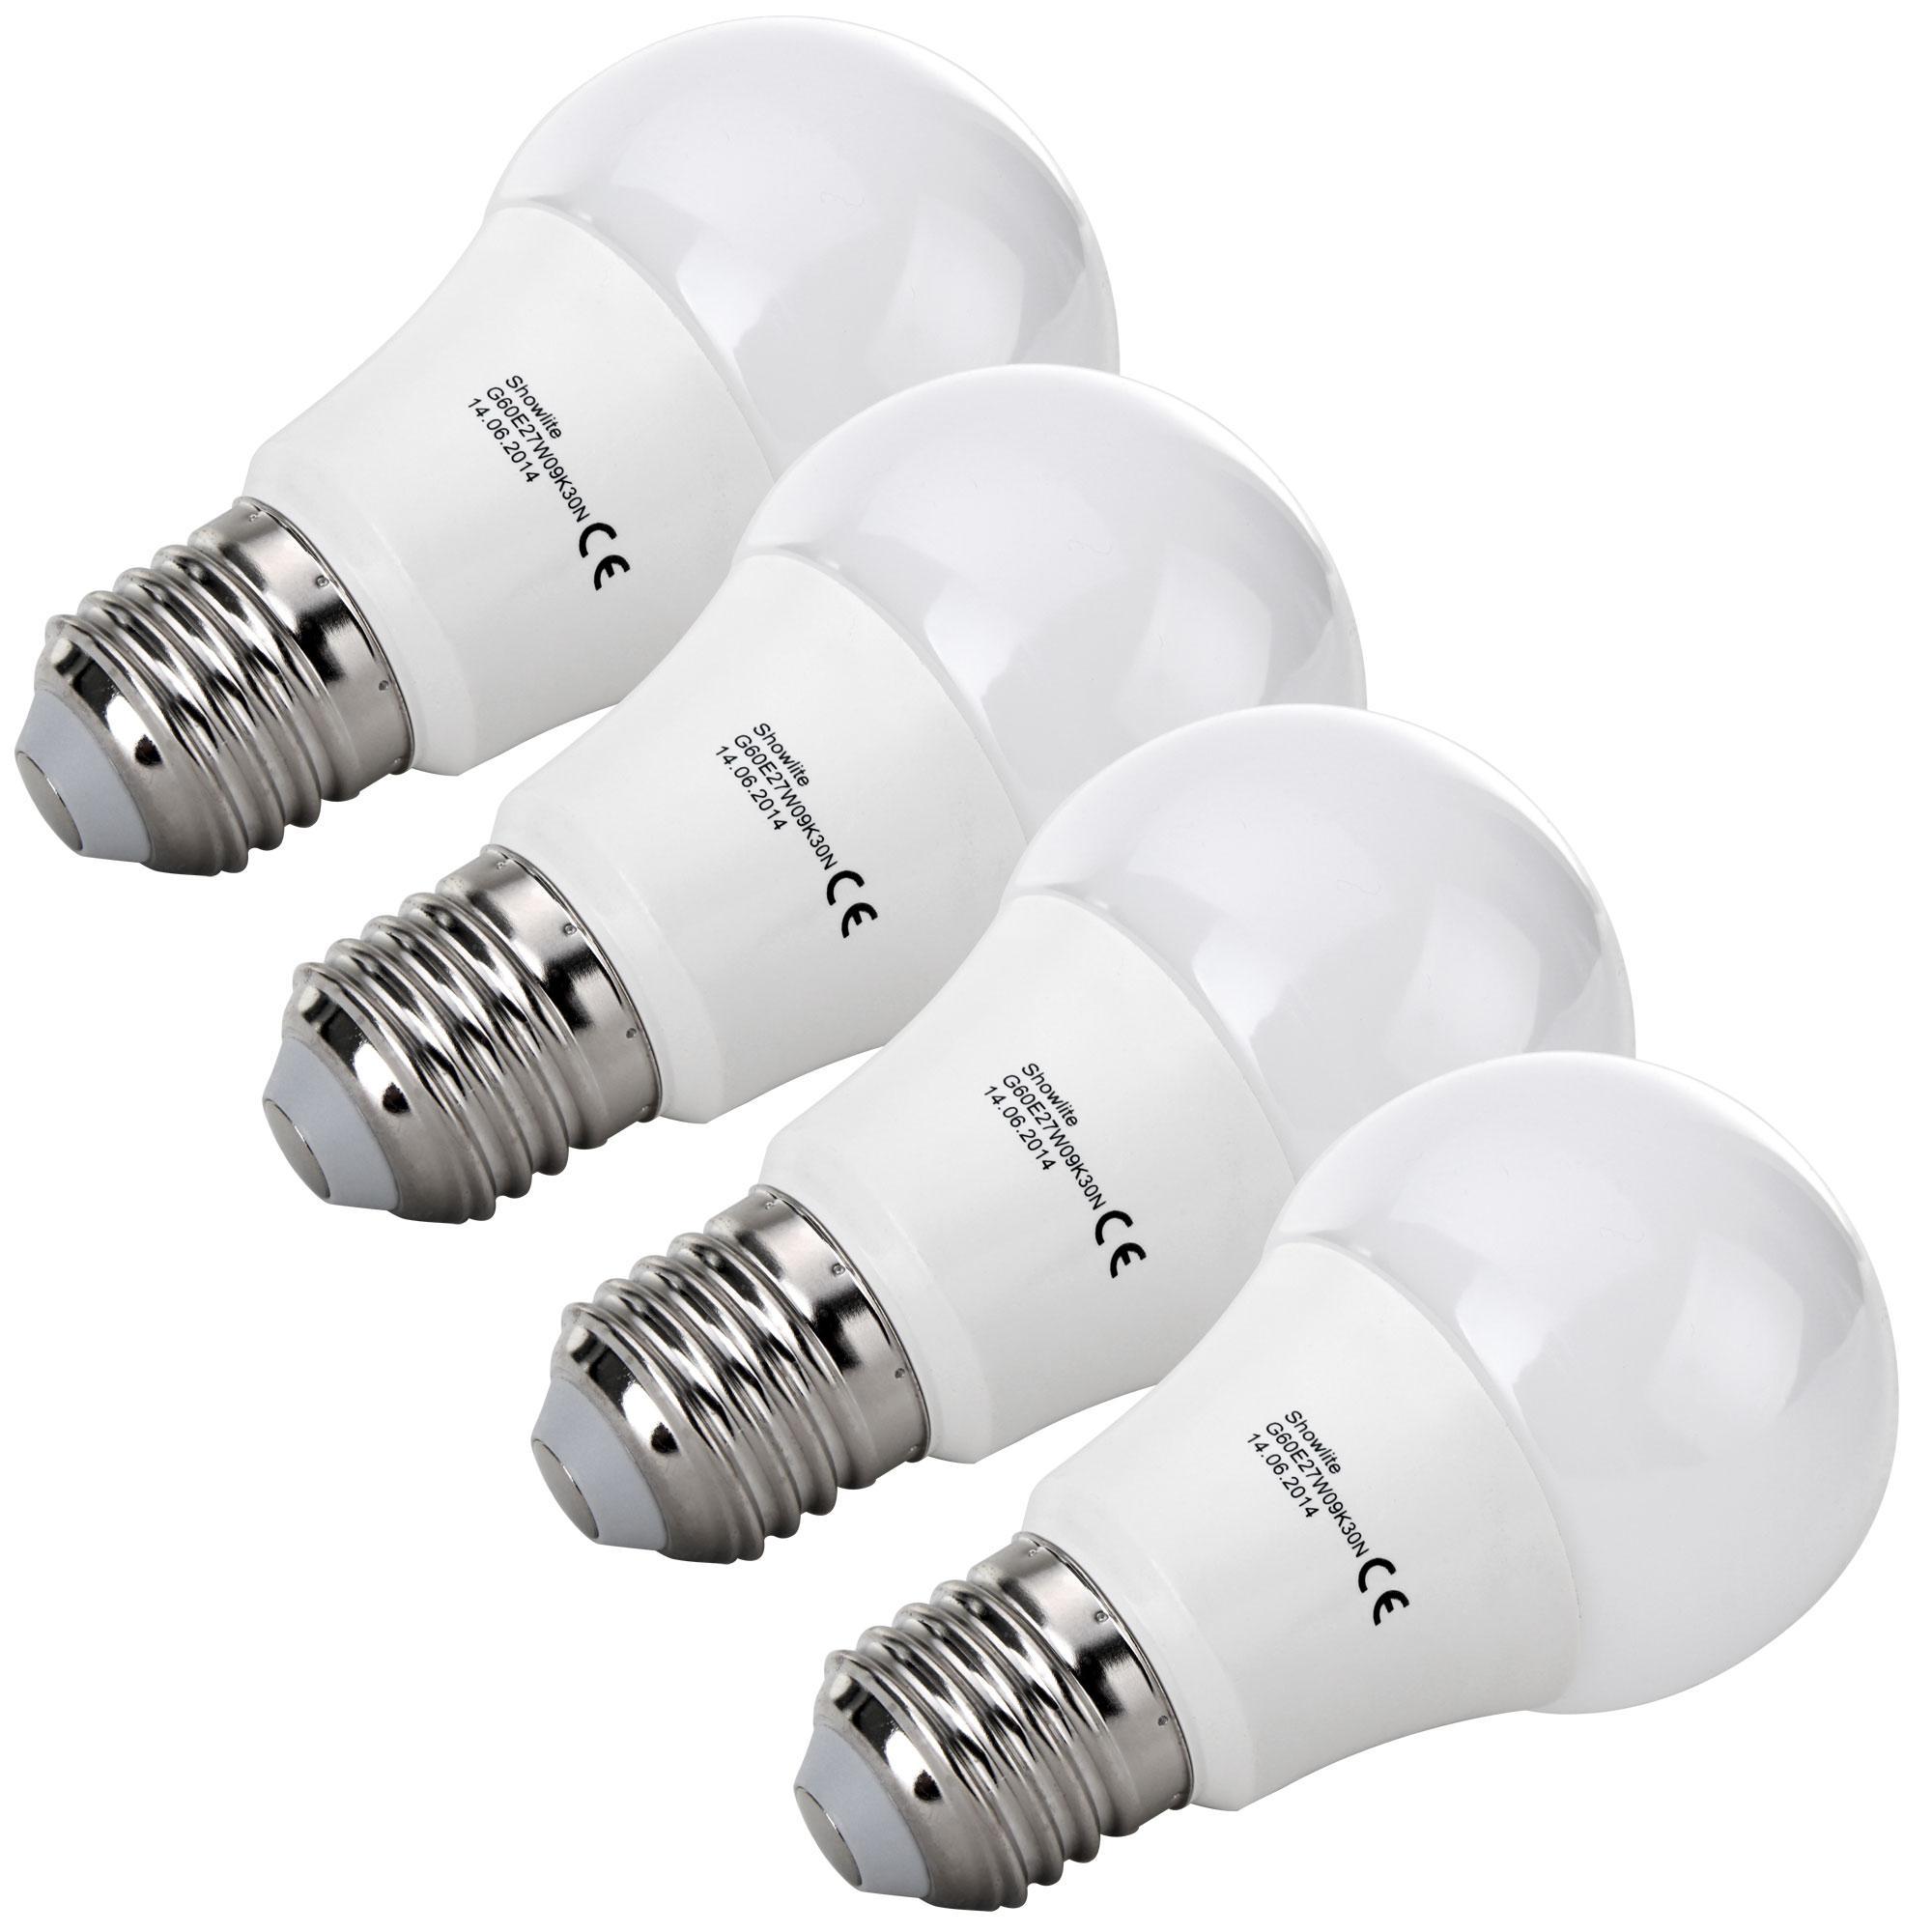 4x set showlite led spotlight g60e27w09k30n 9 watt 860 lumen socket e27 3000 kelvin. Black Bedroom Furniture Sets. Home Design Ideas